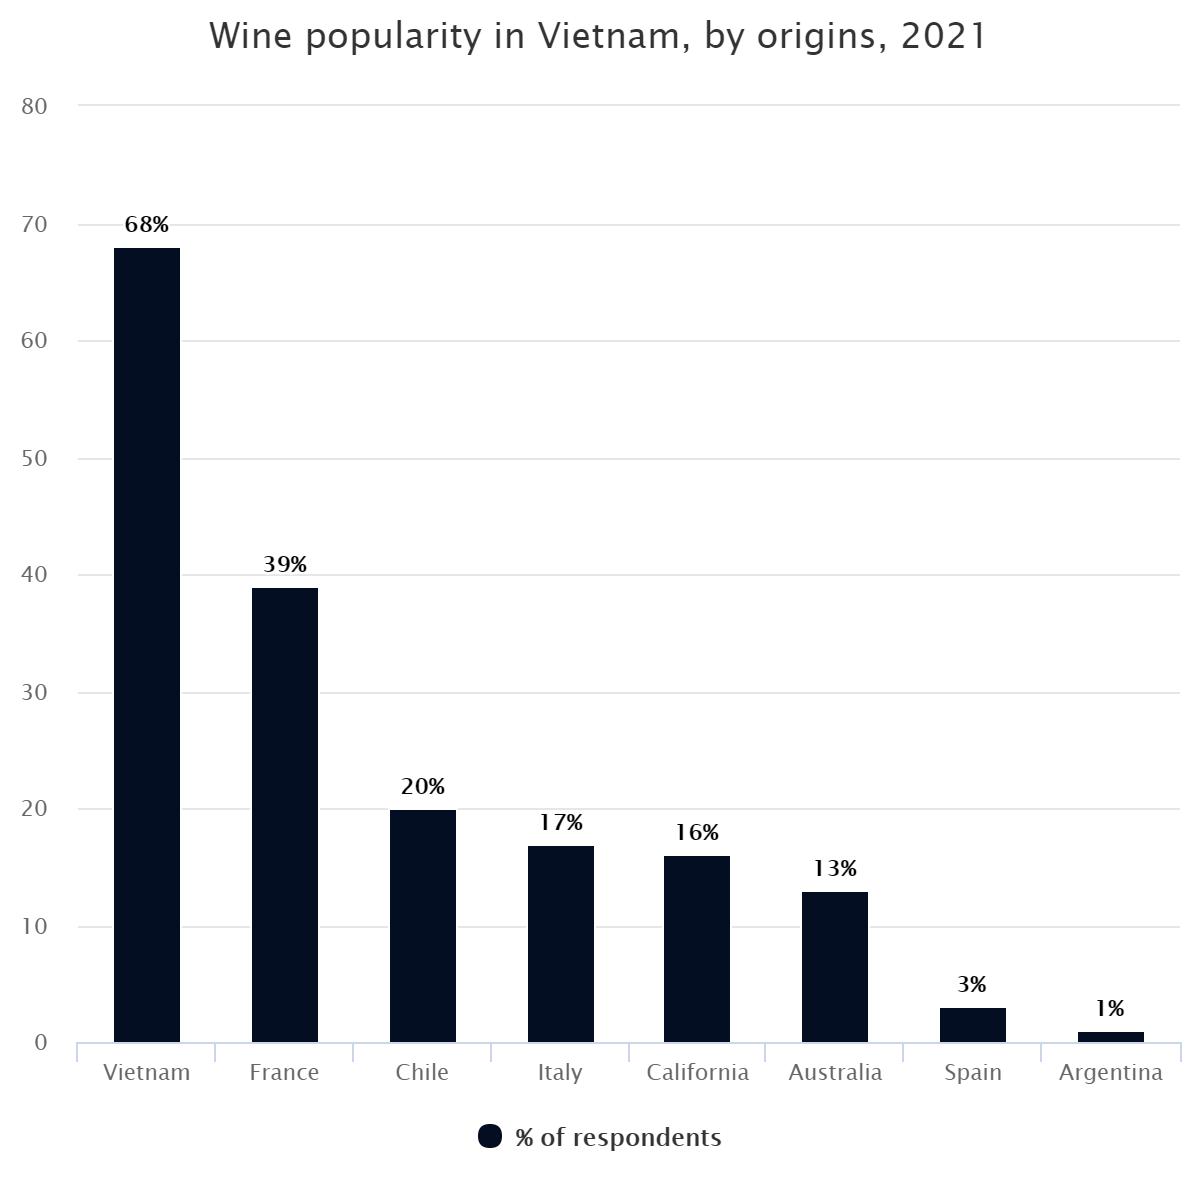 Wine popularity in Vietnam, by origins, 2021